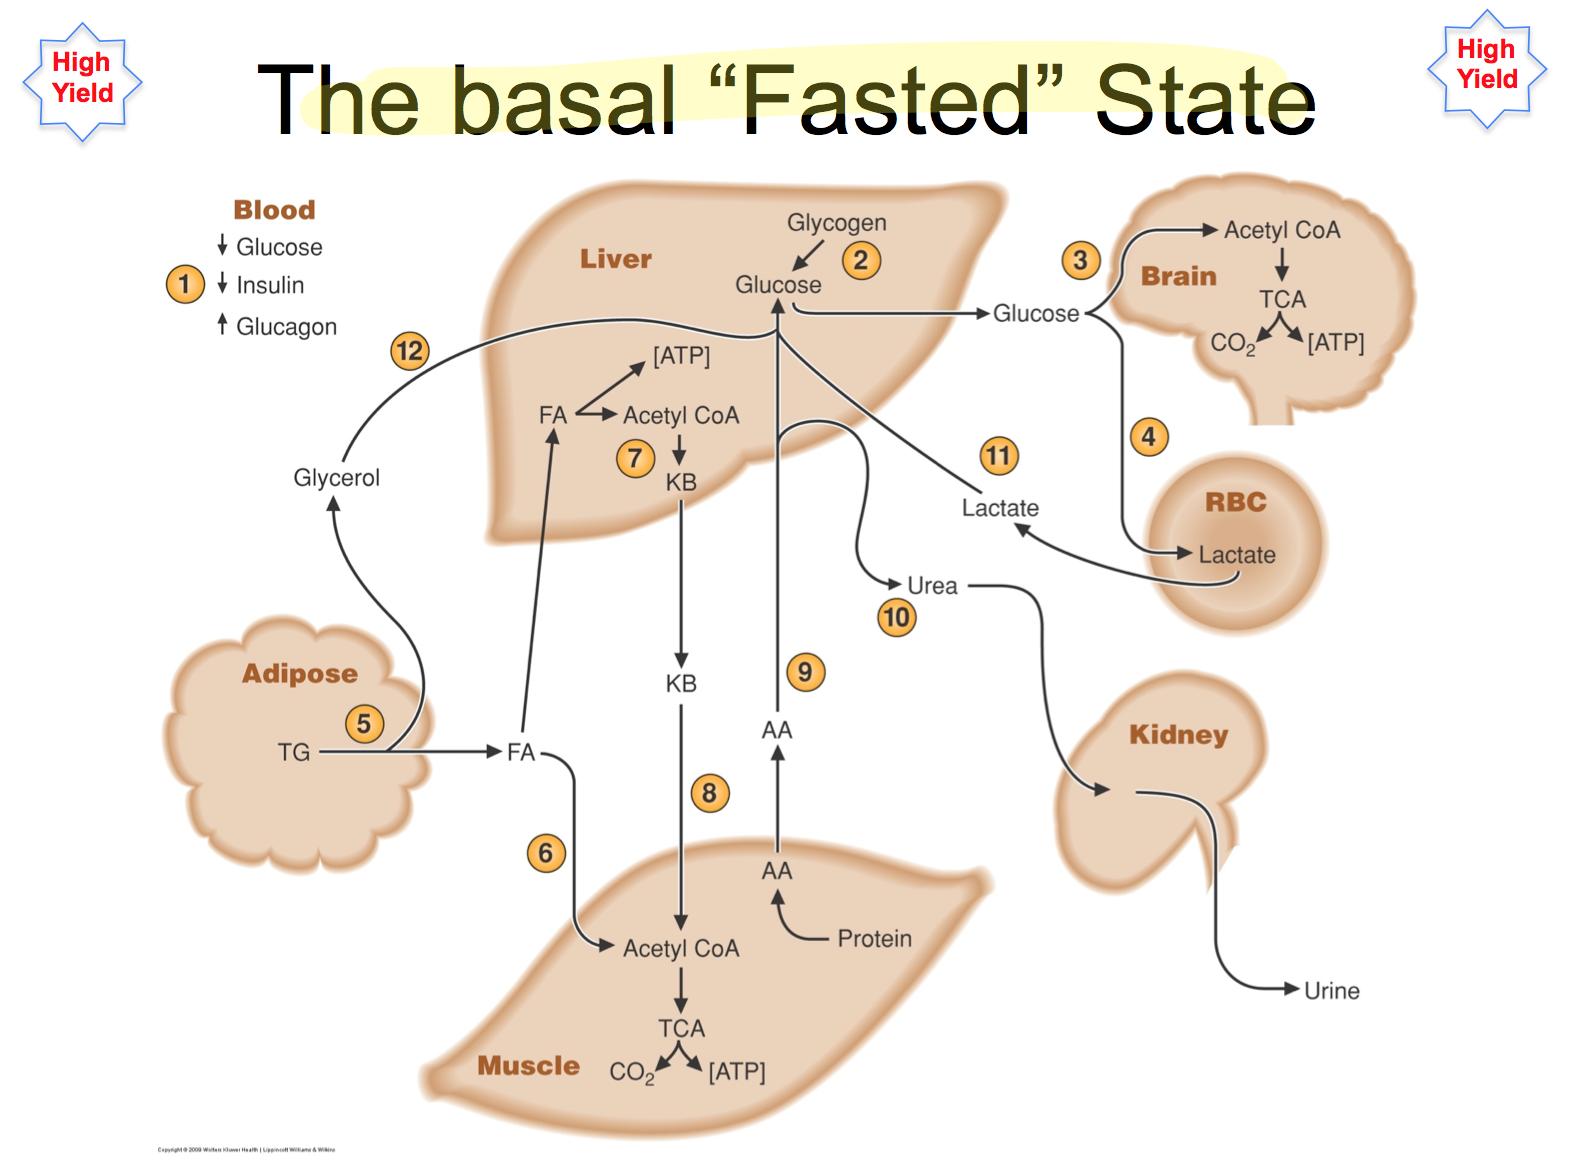 Basal Fasted State Metabolism      Biochemistry